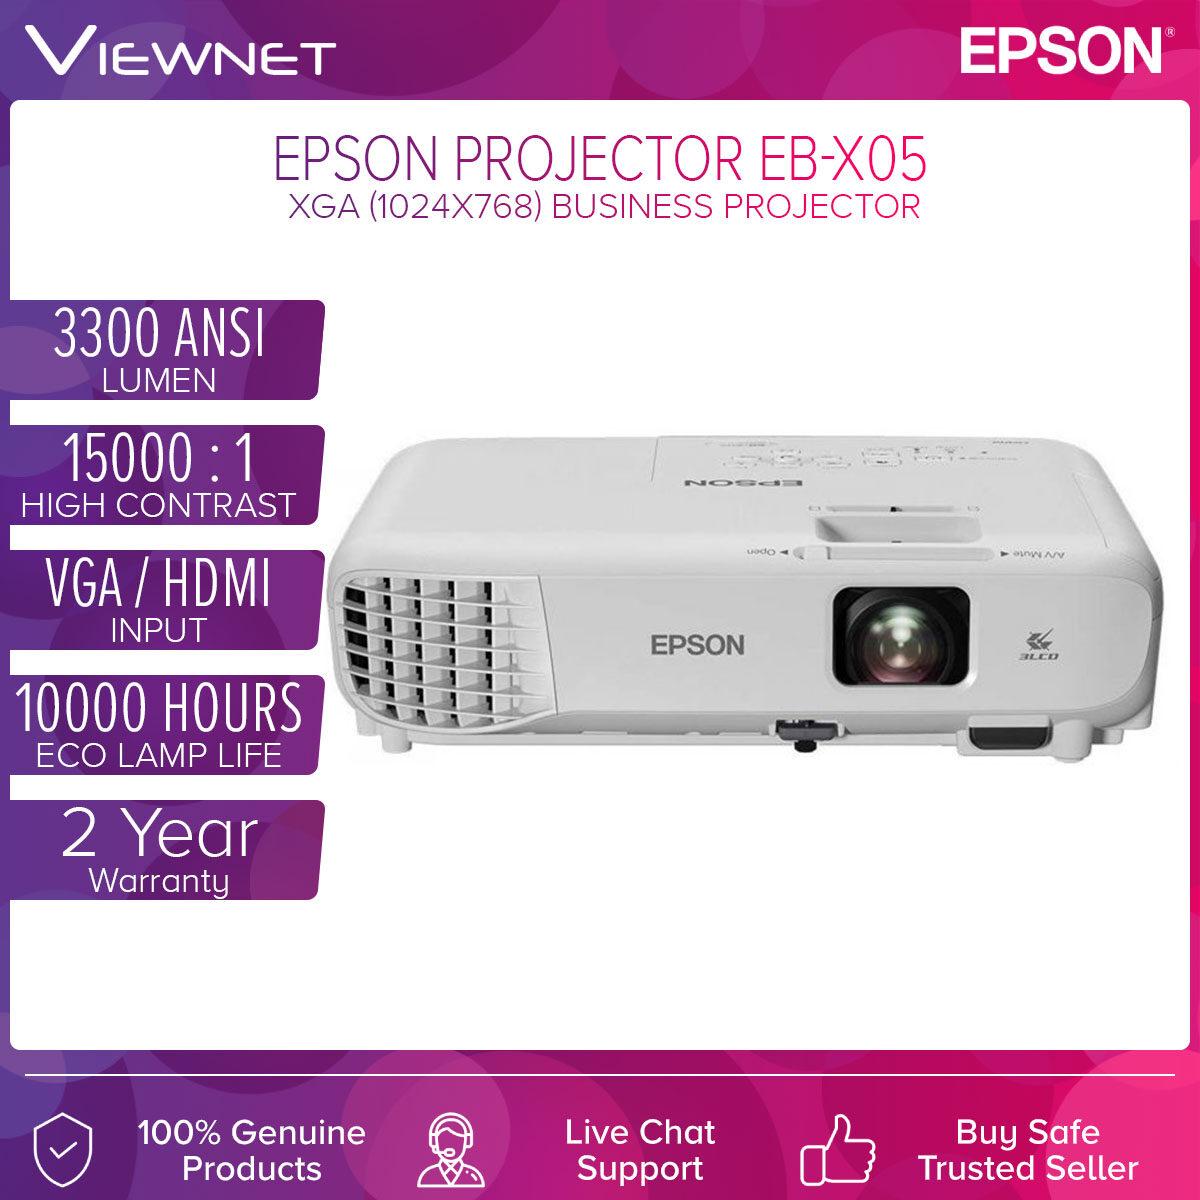 Epson 3LCD XGA Projector (EB-X05) ,(1024x768),, 3300 Lumens (USB/VGA/HDMI), Wireless